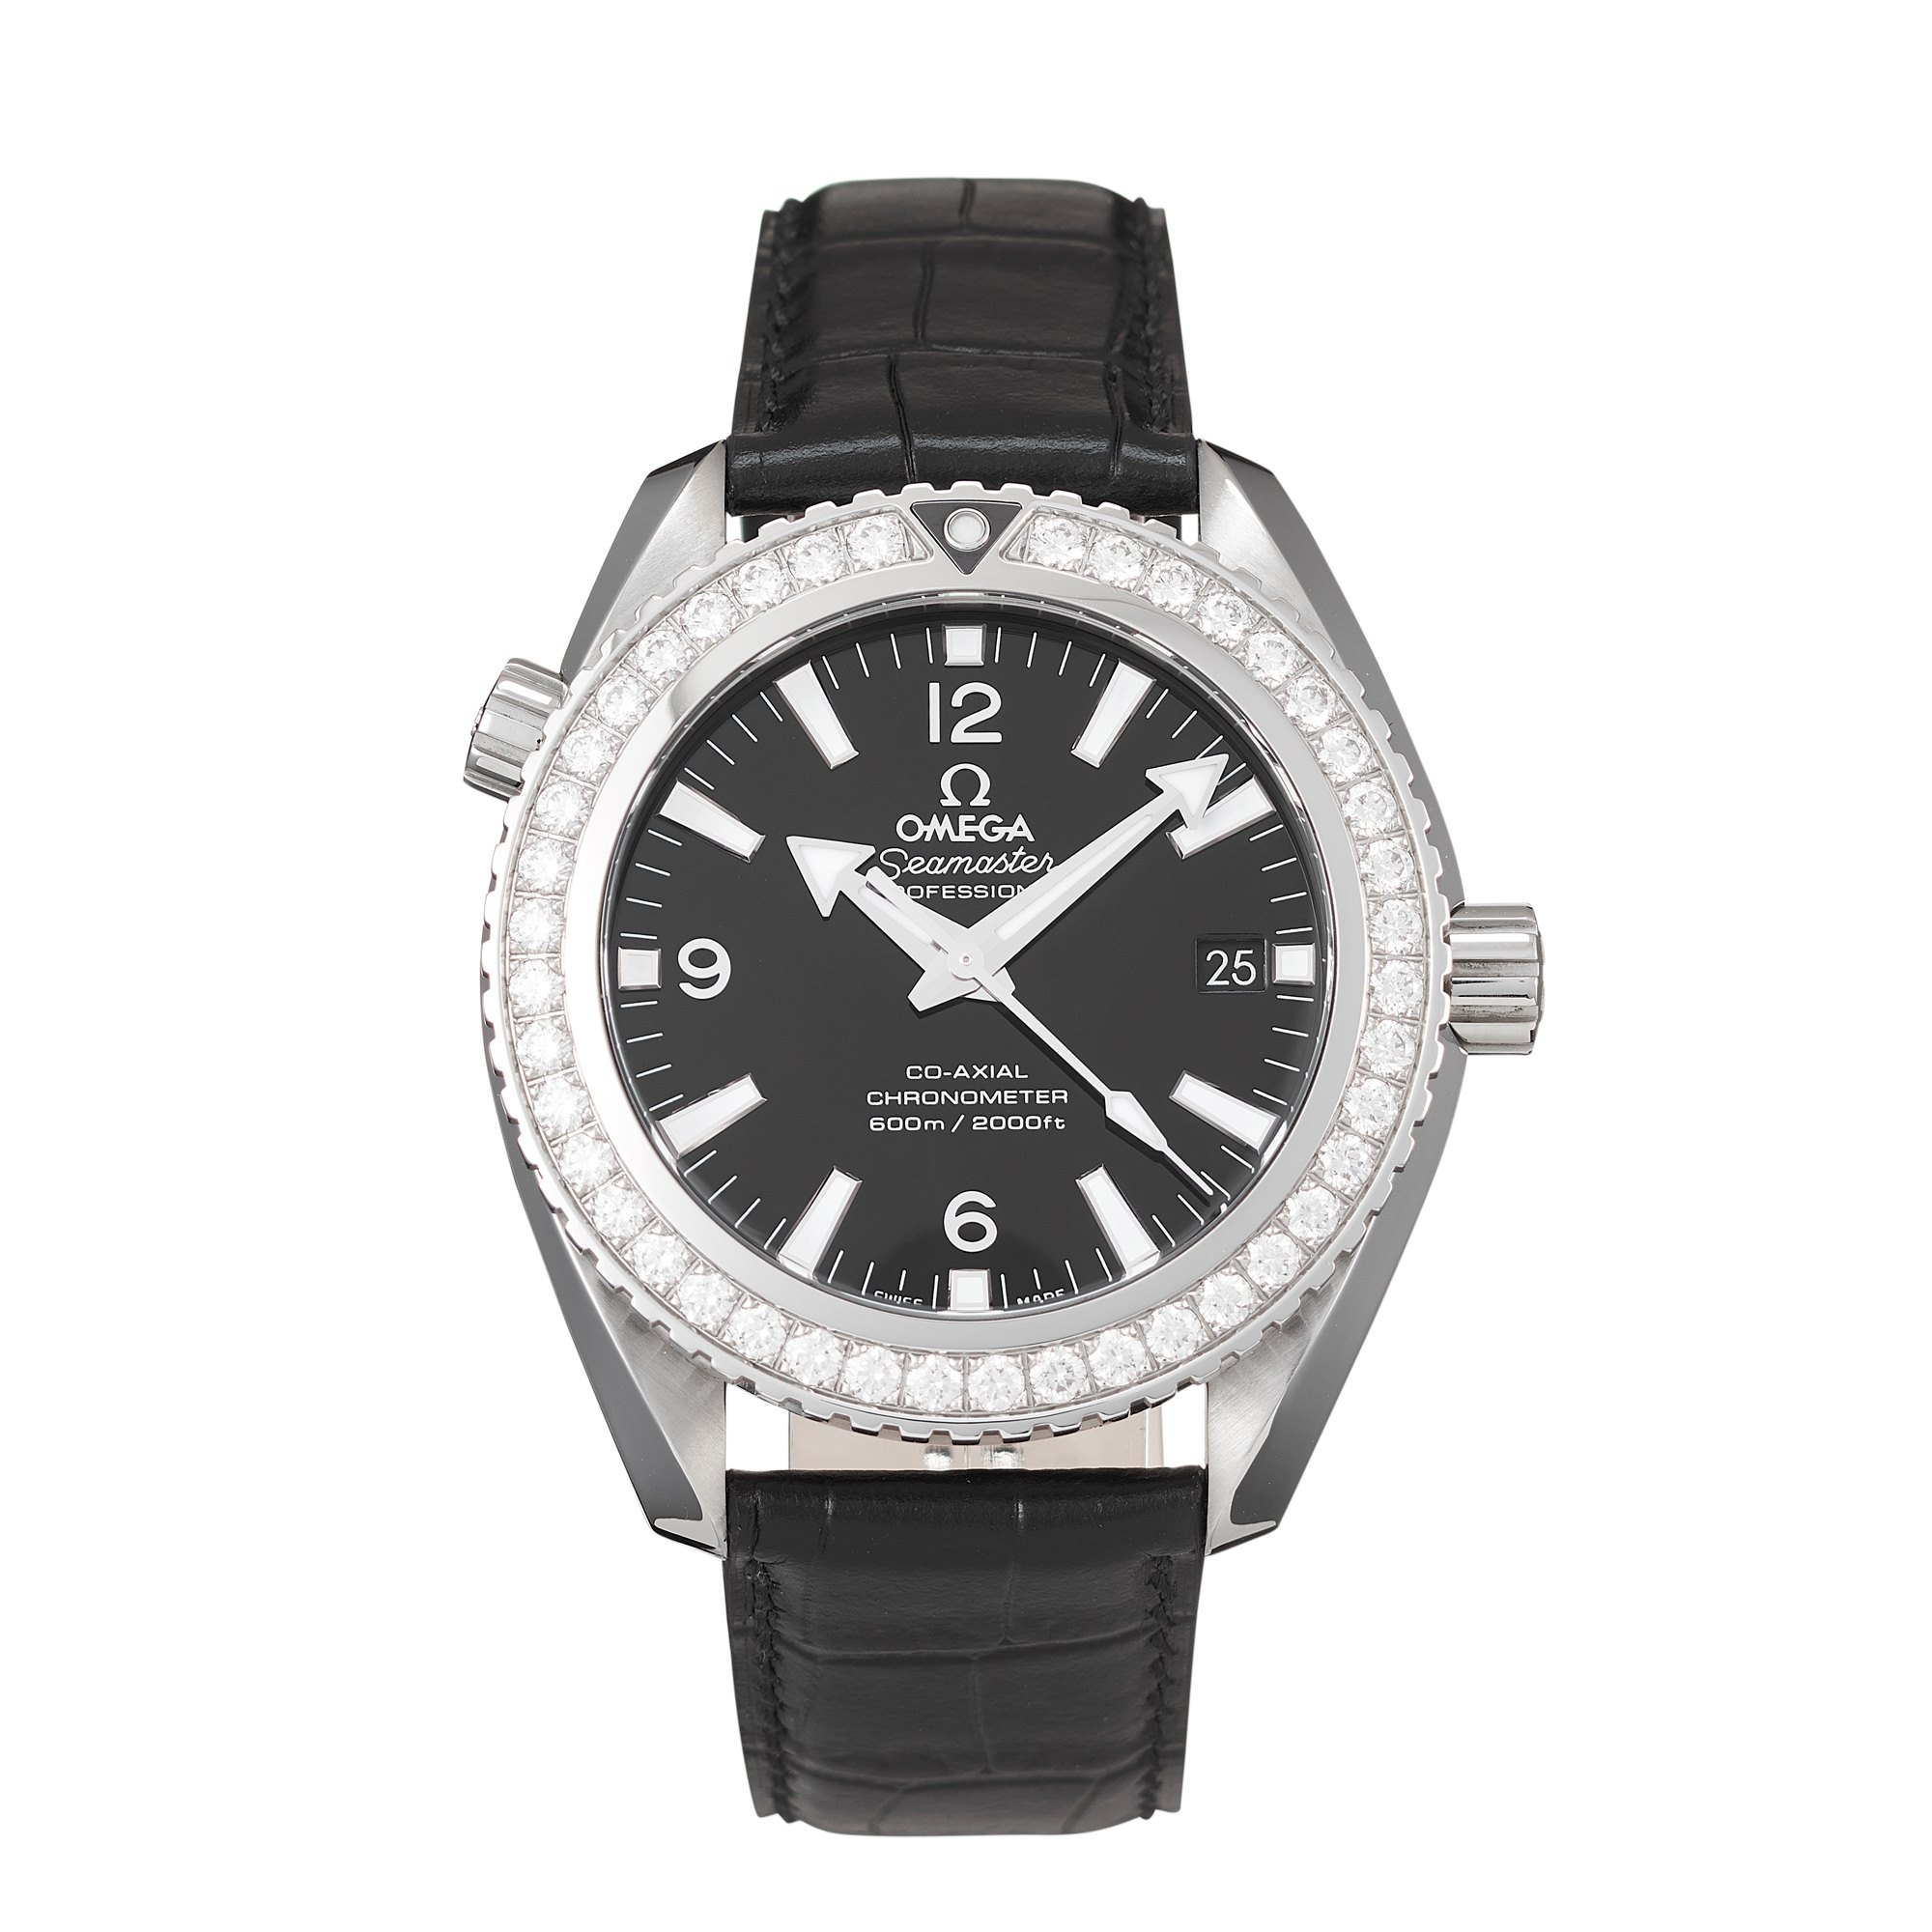 Omega Seamaster Seamaster Stainless Steel 232.18.42.21.01.001